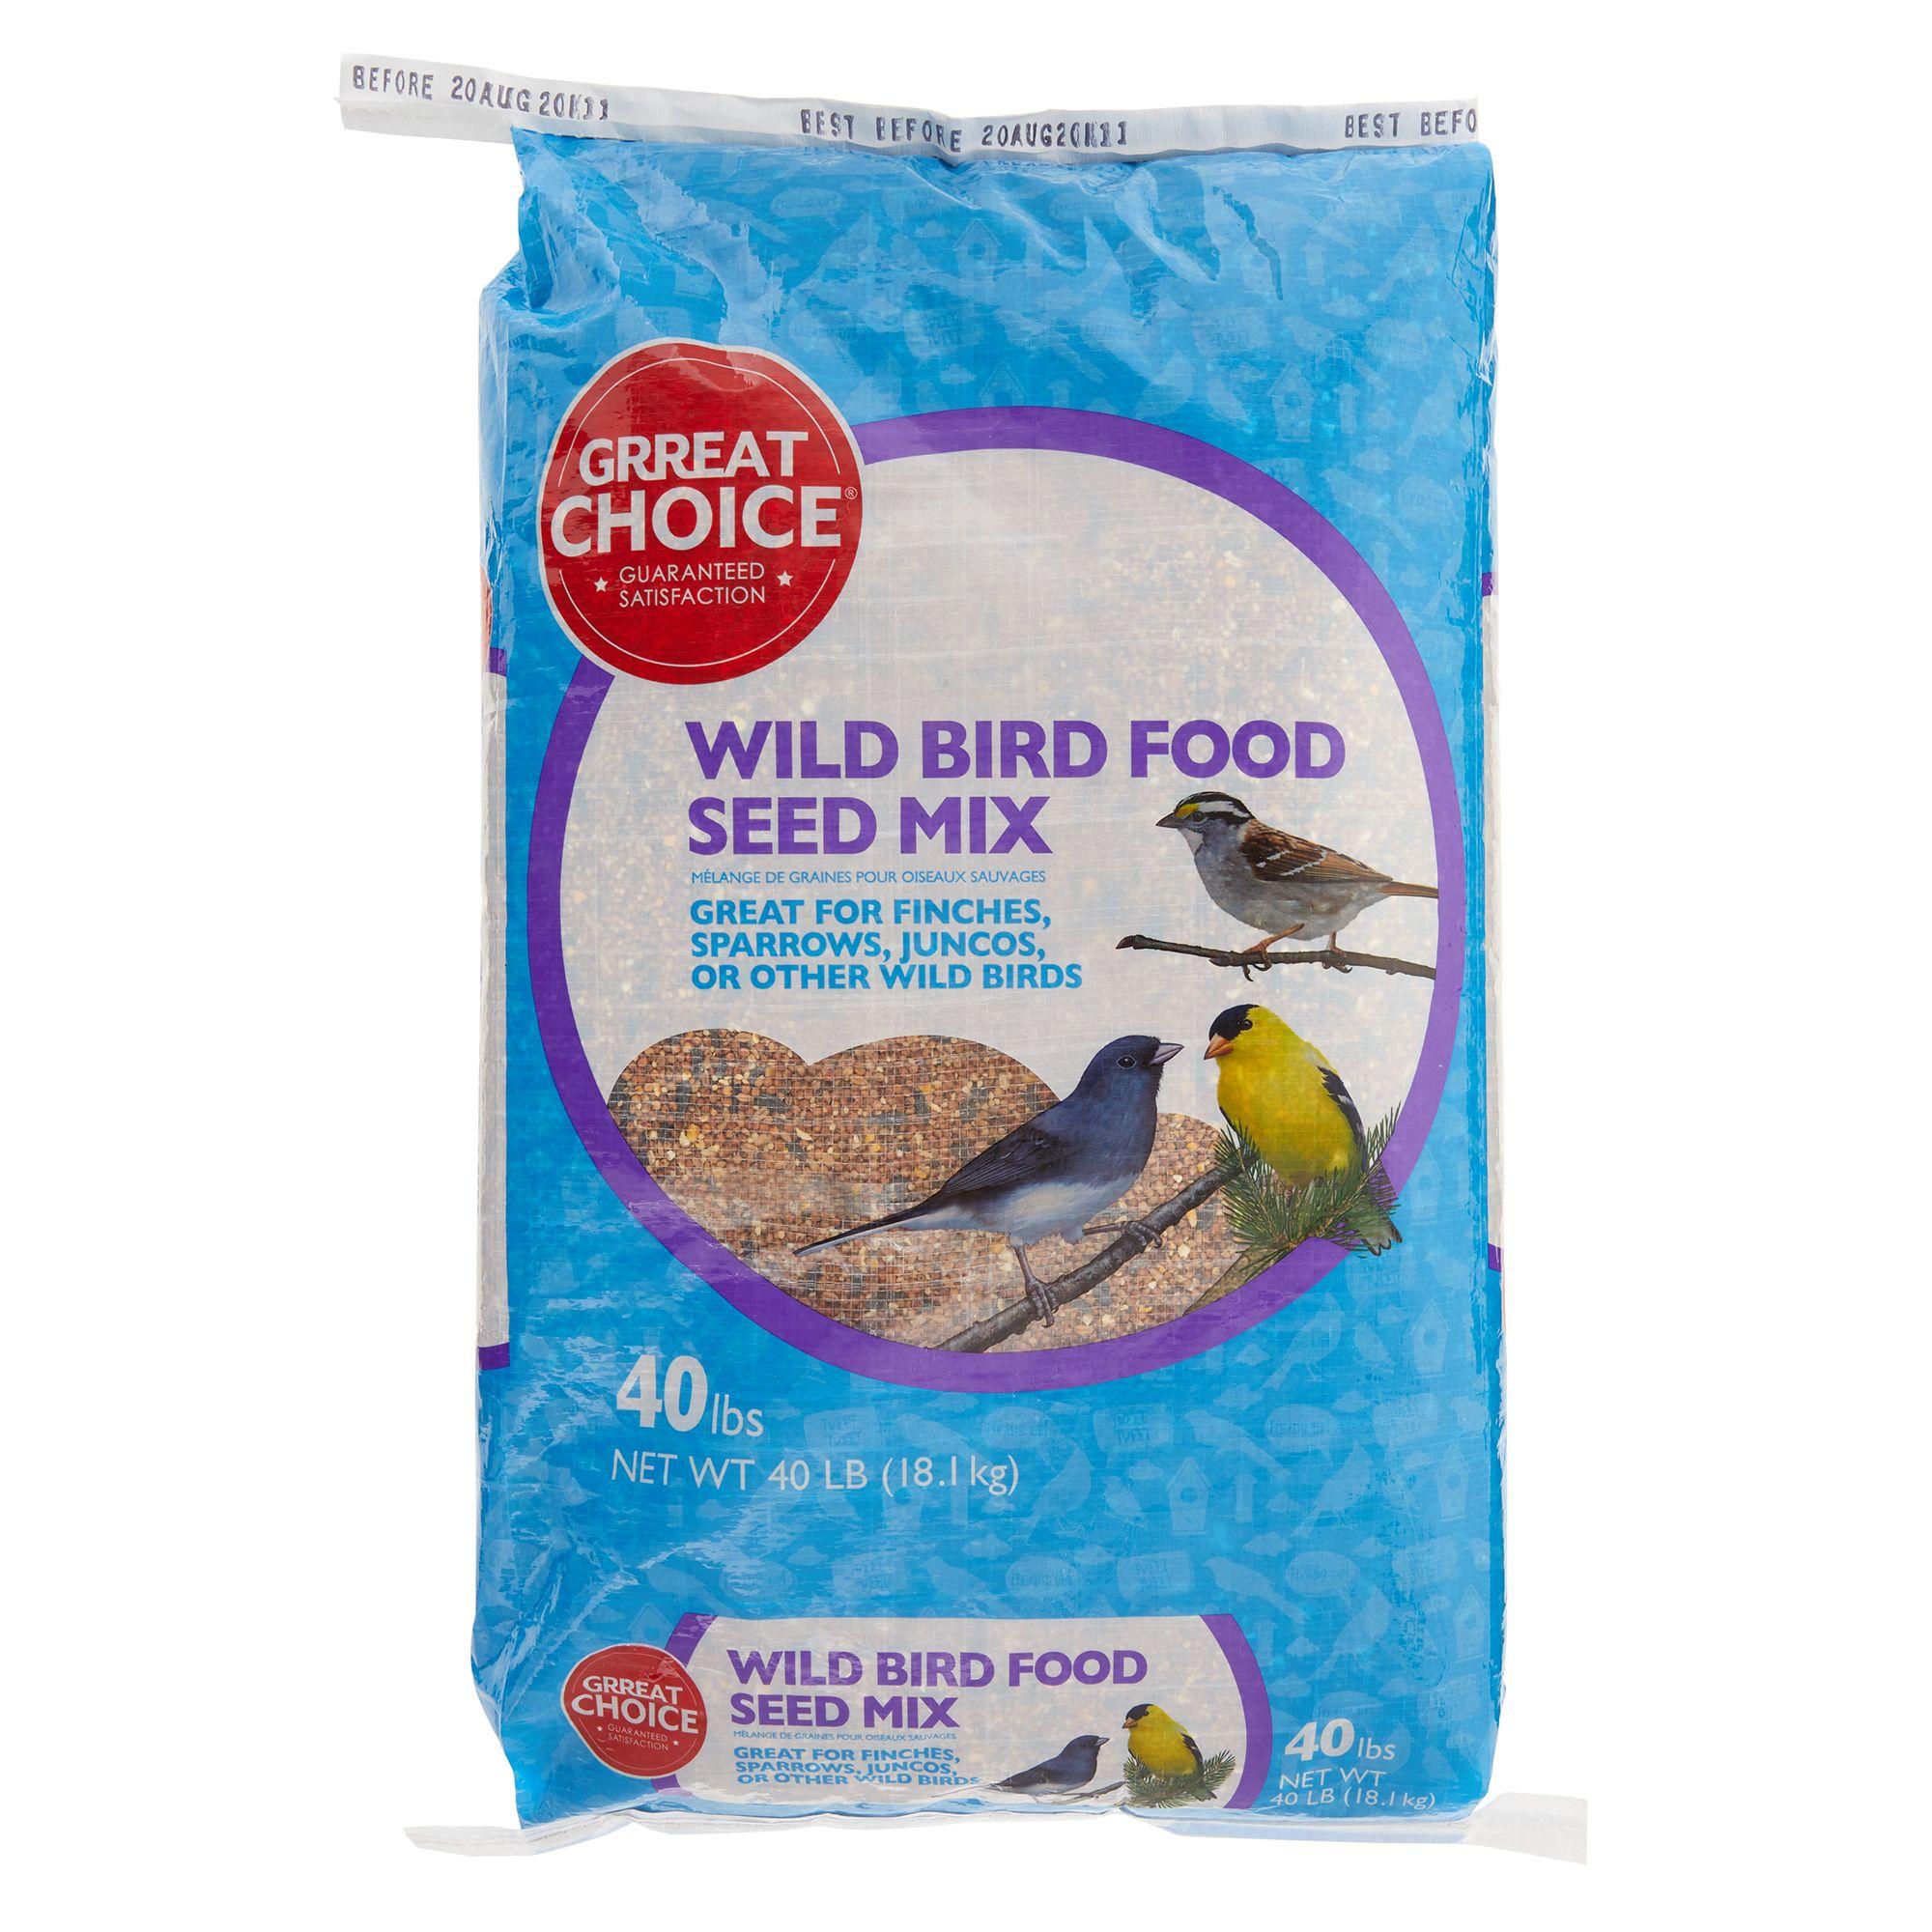 Grreat Choice Wild Bird Seed Mix size: 40 Lb